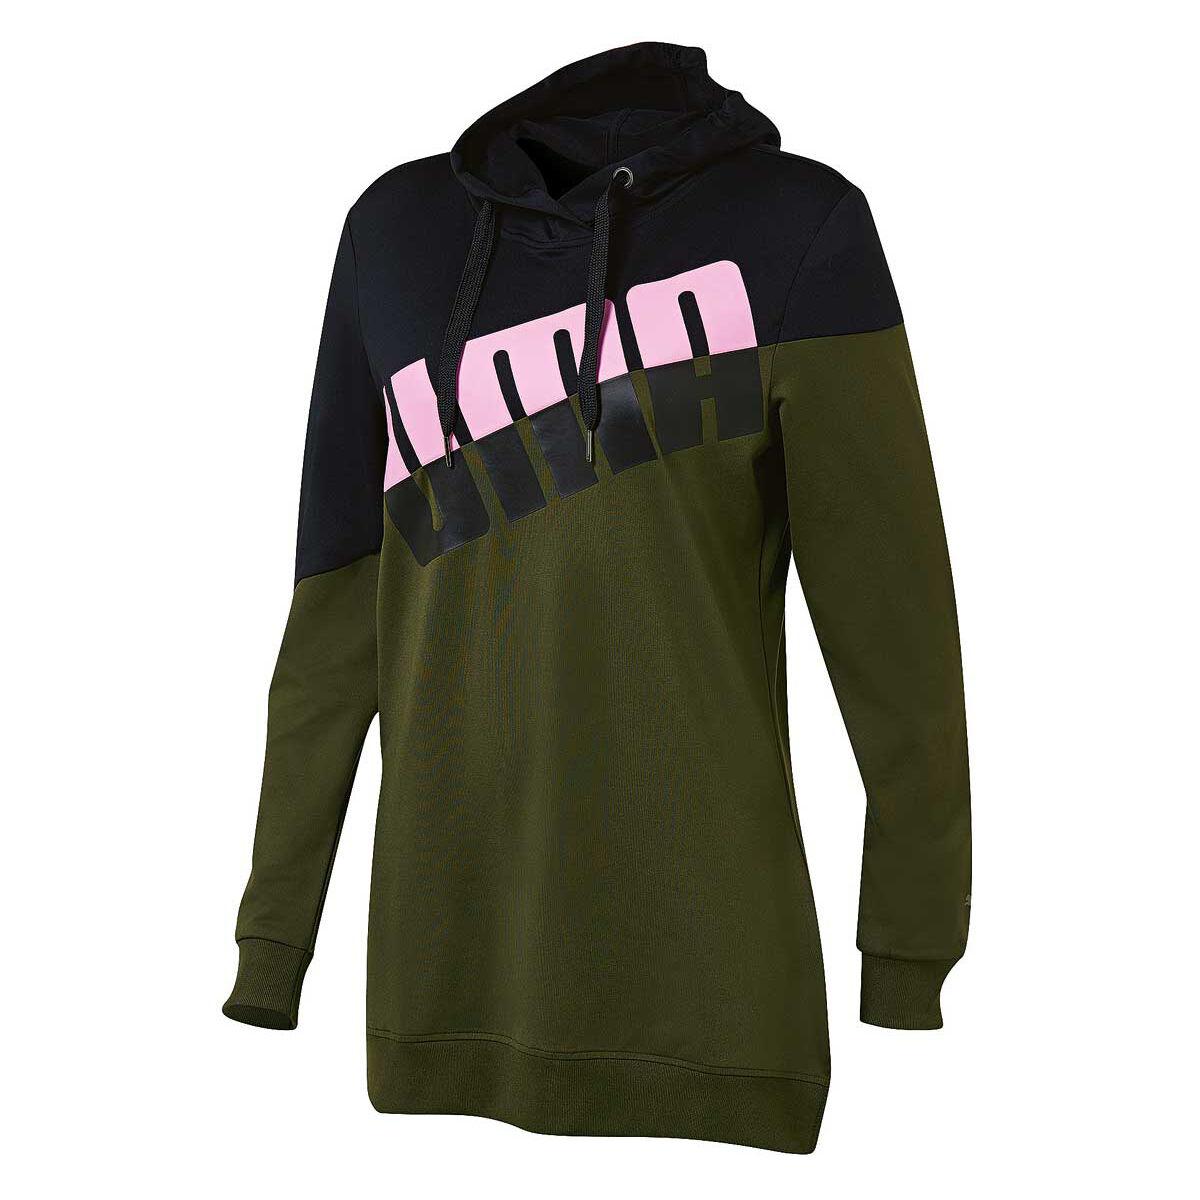 Puma Womens A.C.E. Blocked Hoodie | Rebel Sport  for cheap